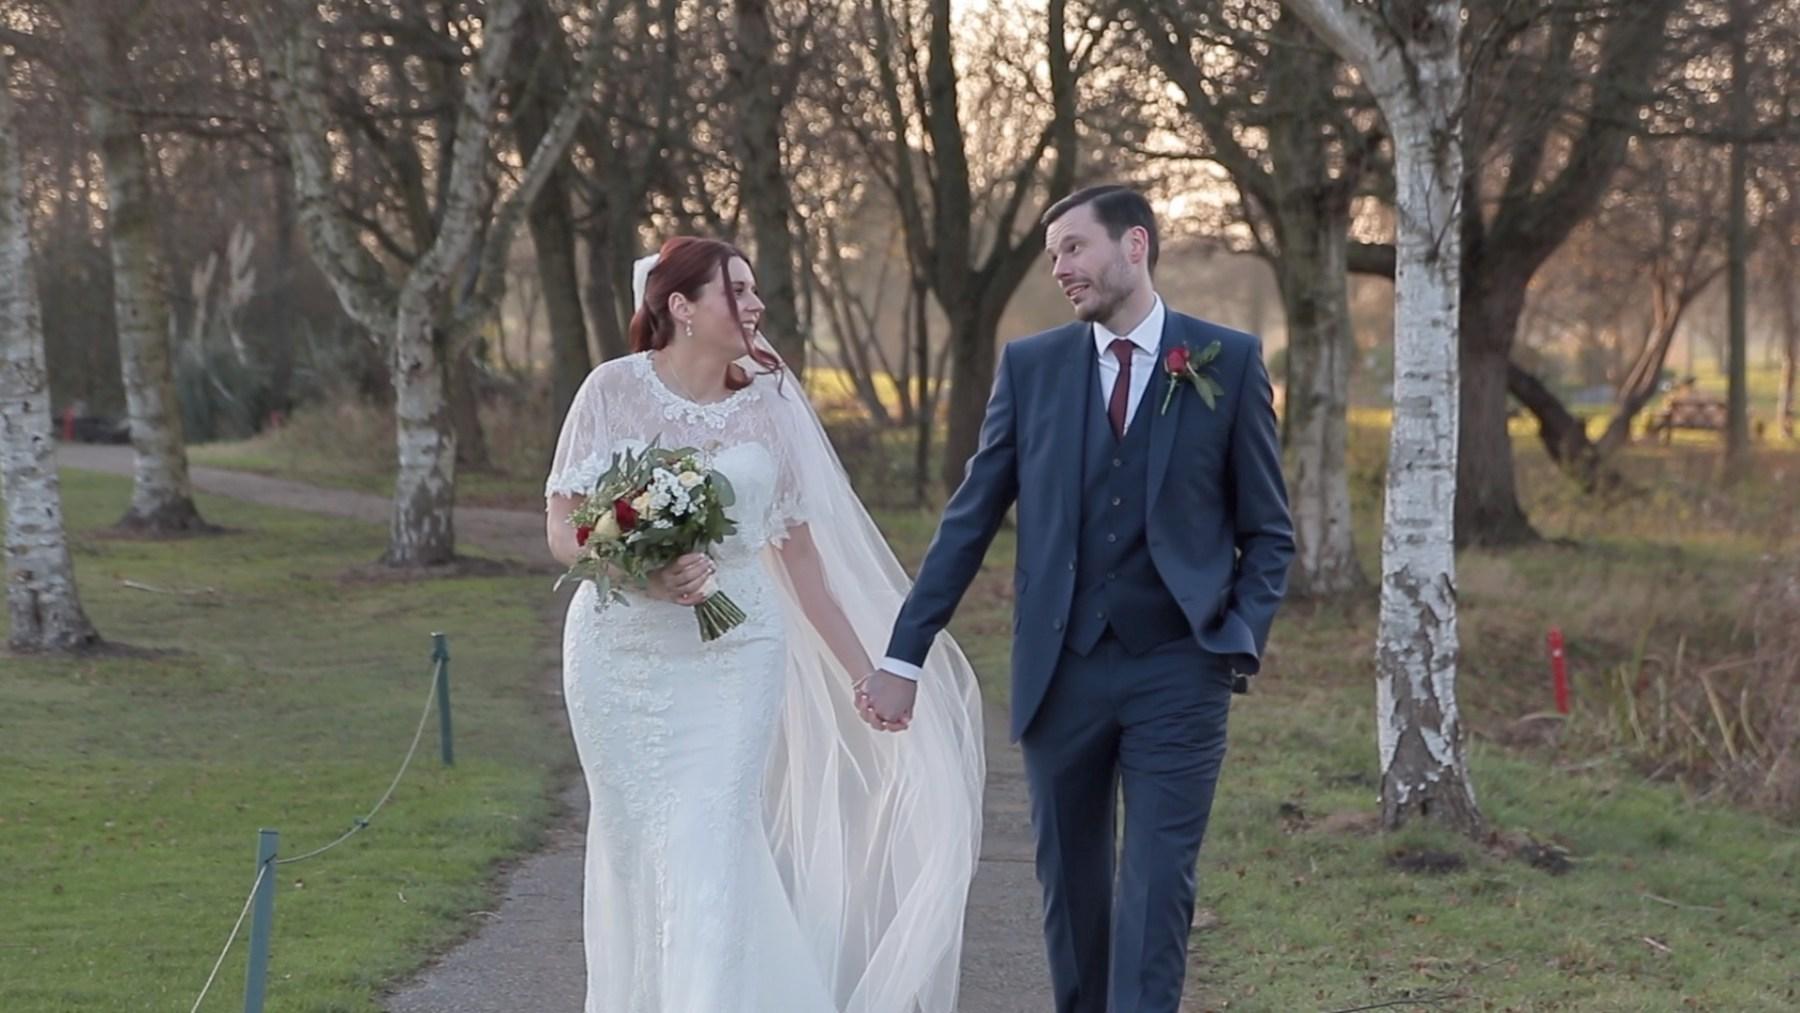 Wedding at Formby Hall near Liverpool